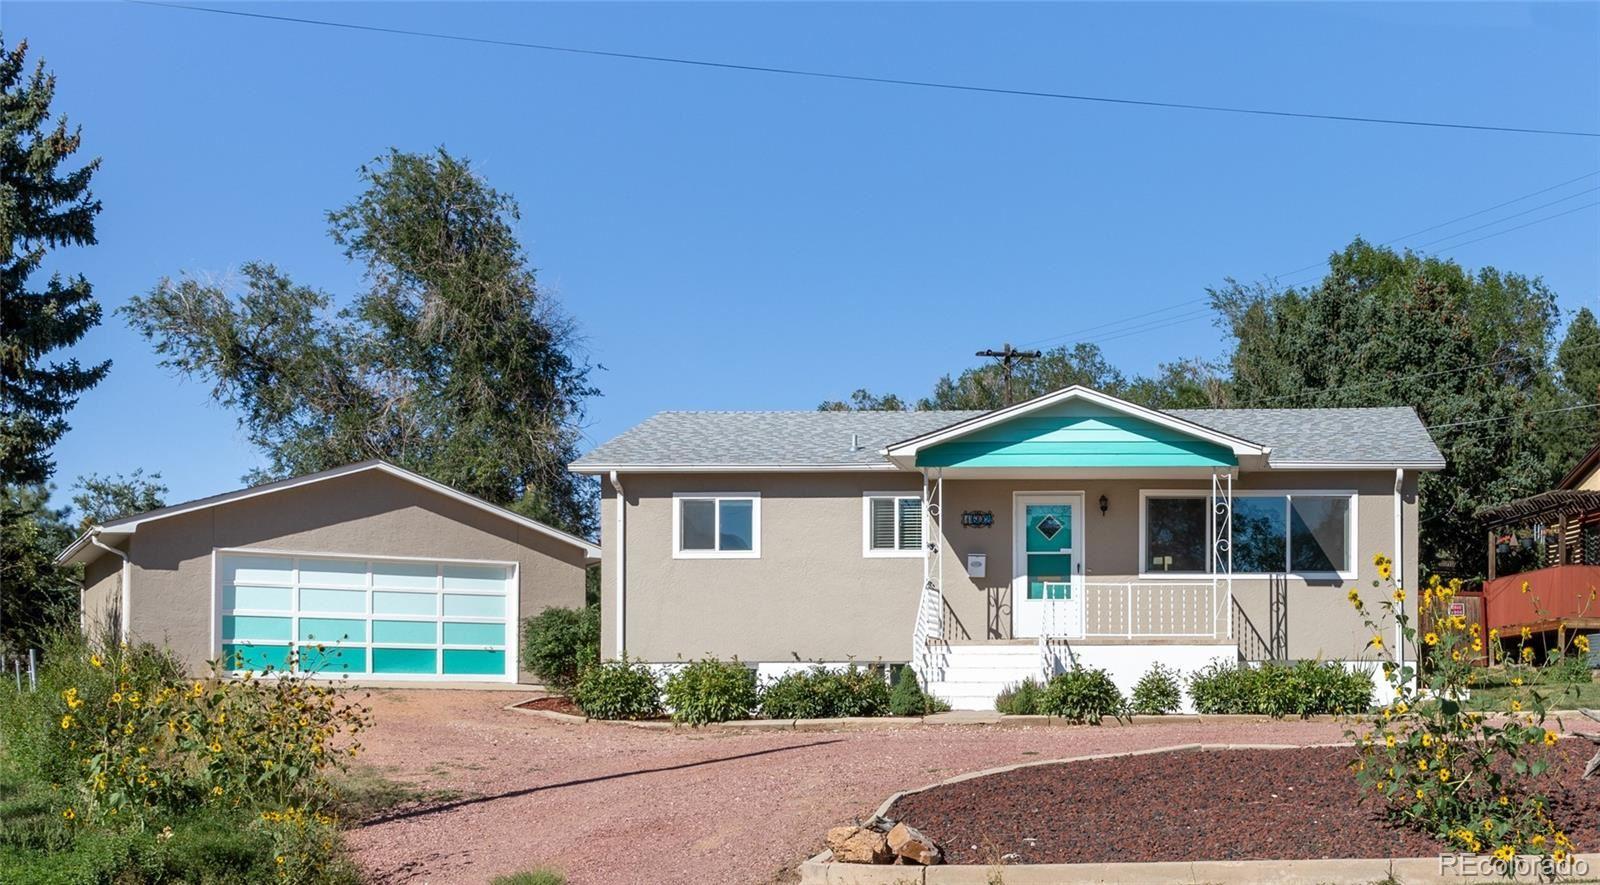 1602 W Saint Vrain Street, Colorado Springs, CO 80904 - MLS#: 5890992